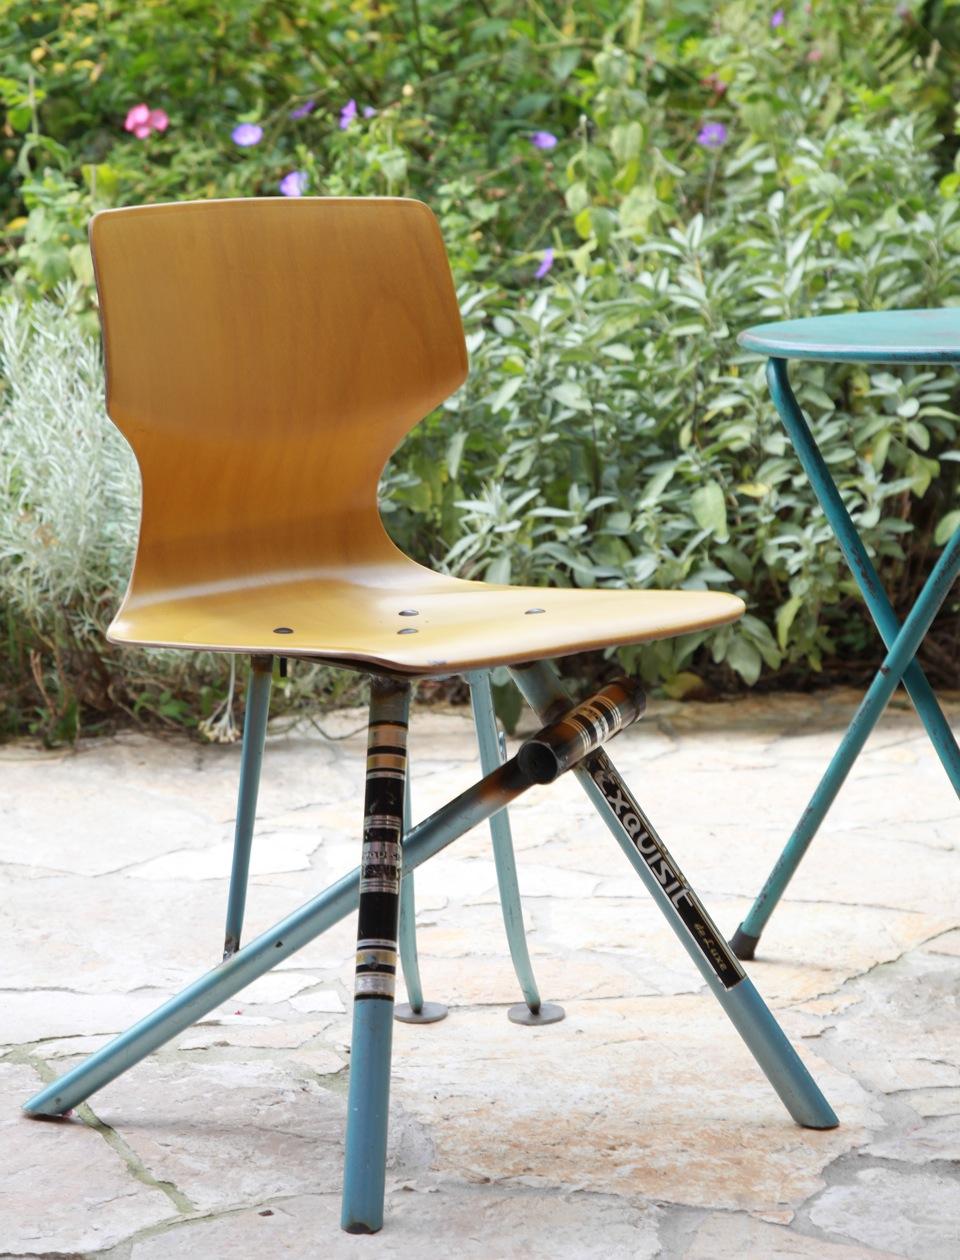 Formsitz upcycling design st hle aus alten fahrradrahmen for Stuhl upcycling